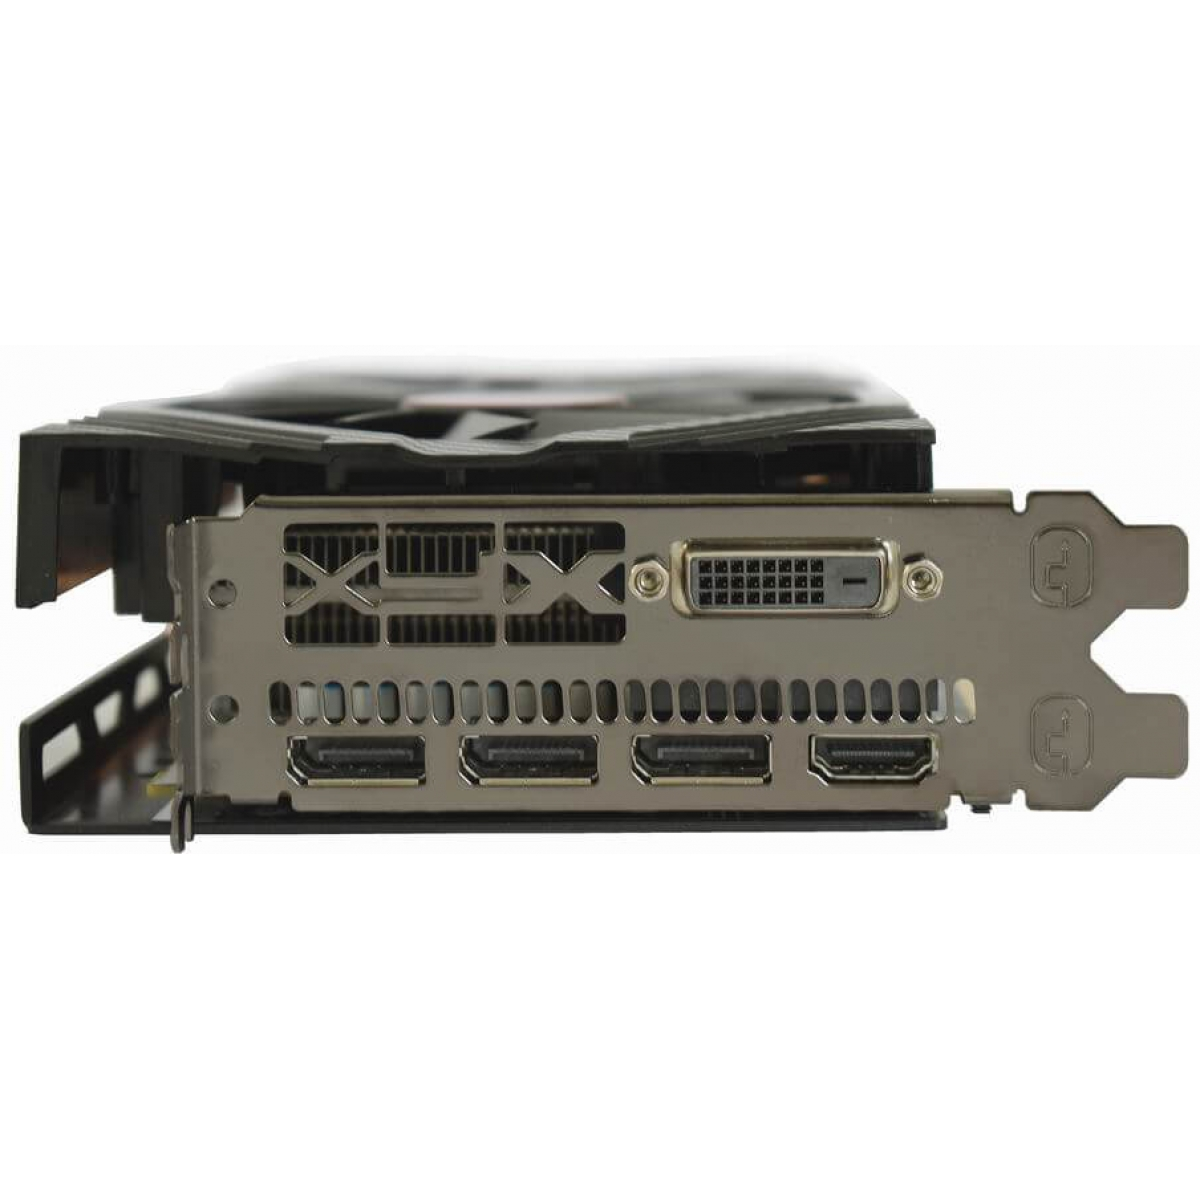 Placa de Vídeo XFX Radeon RX 590 Fatboy Dual OC+, 8GB GDDR5, 256Bit, RX-590P8DFD6